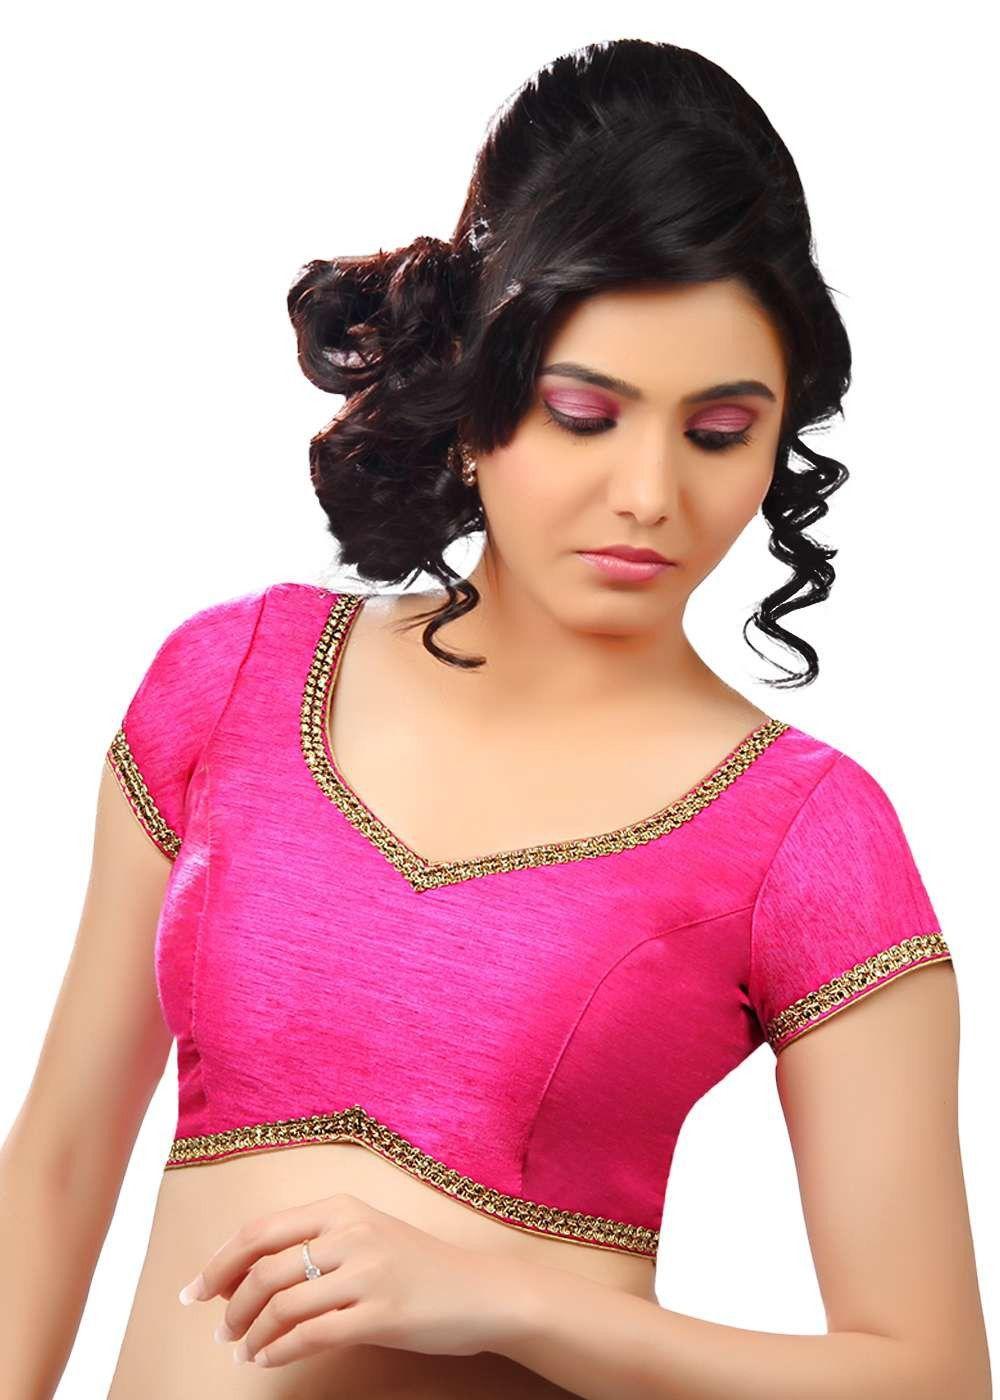 d68bc004449d3 Classic Lace Border Pink Sari Blouse SNT-X-203-SL